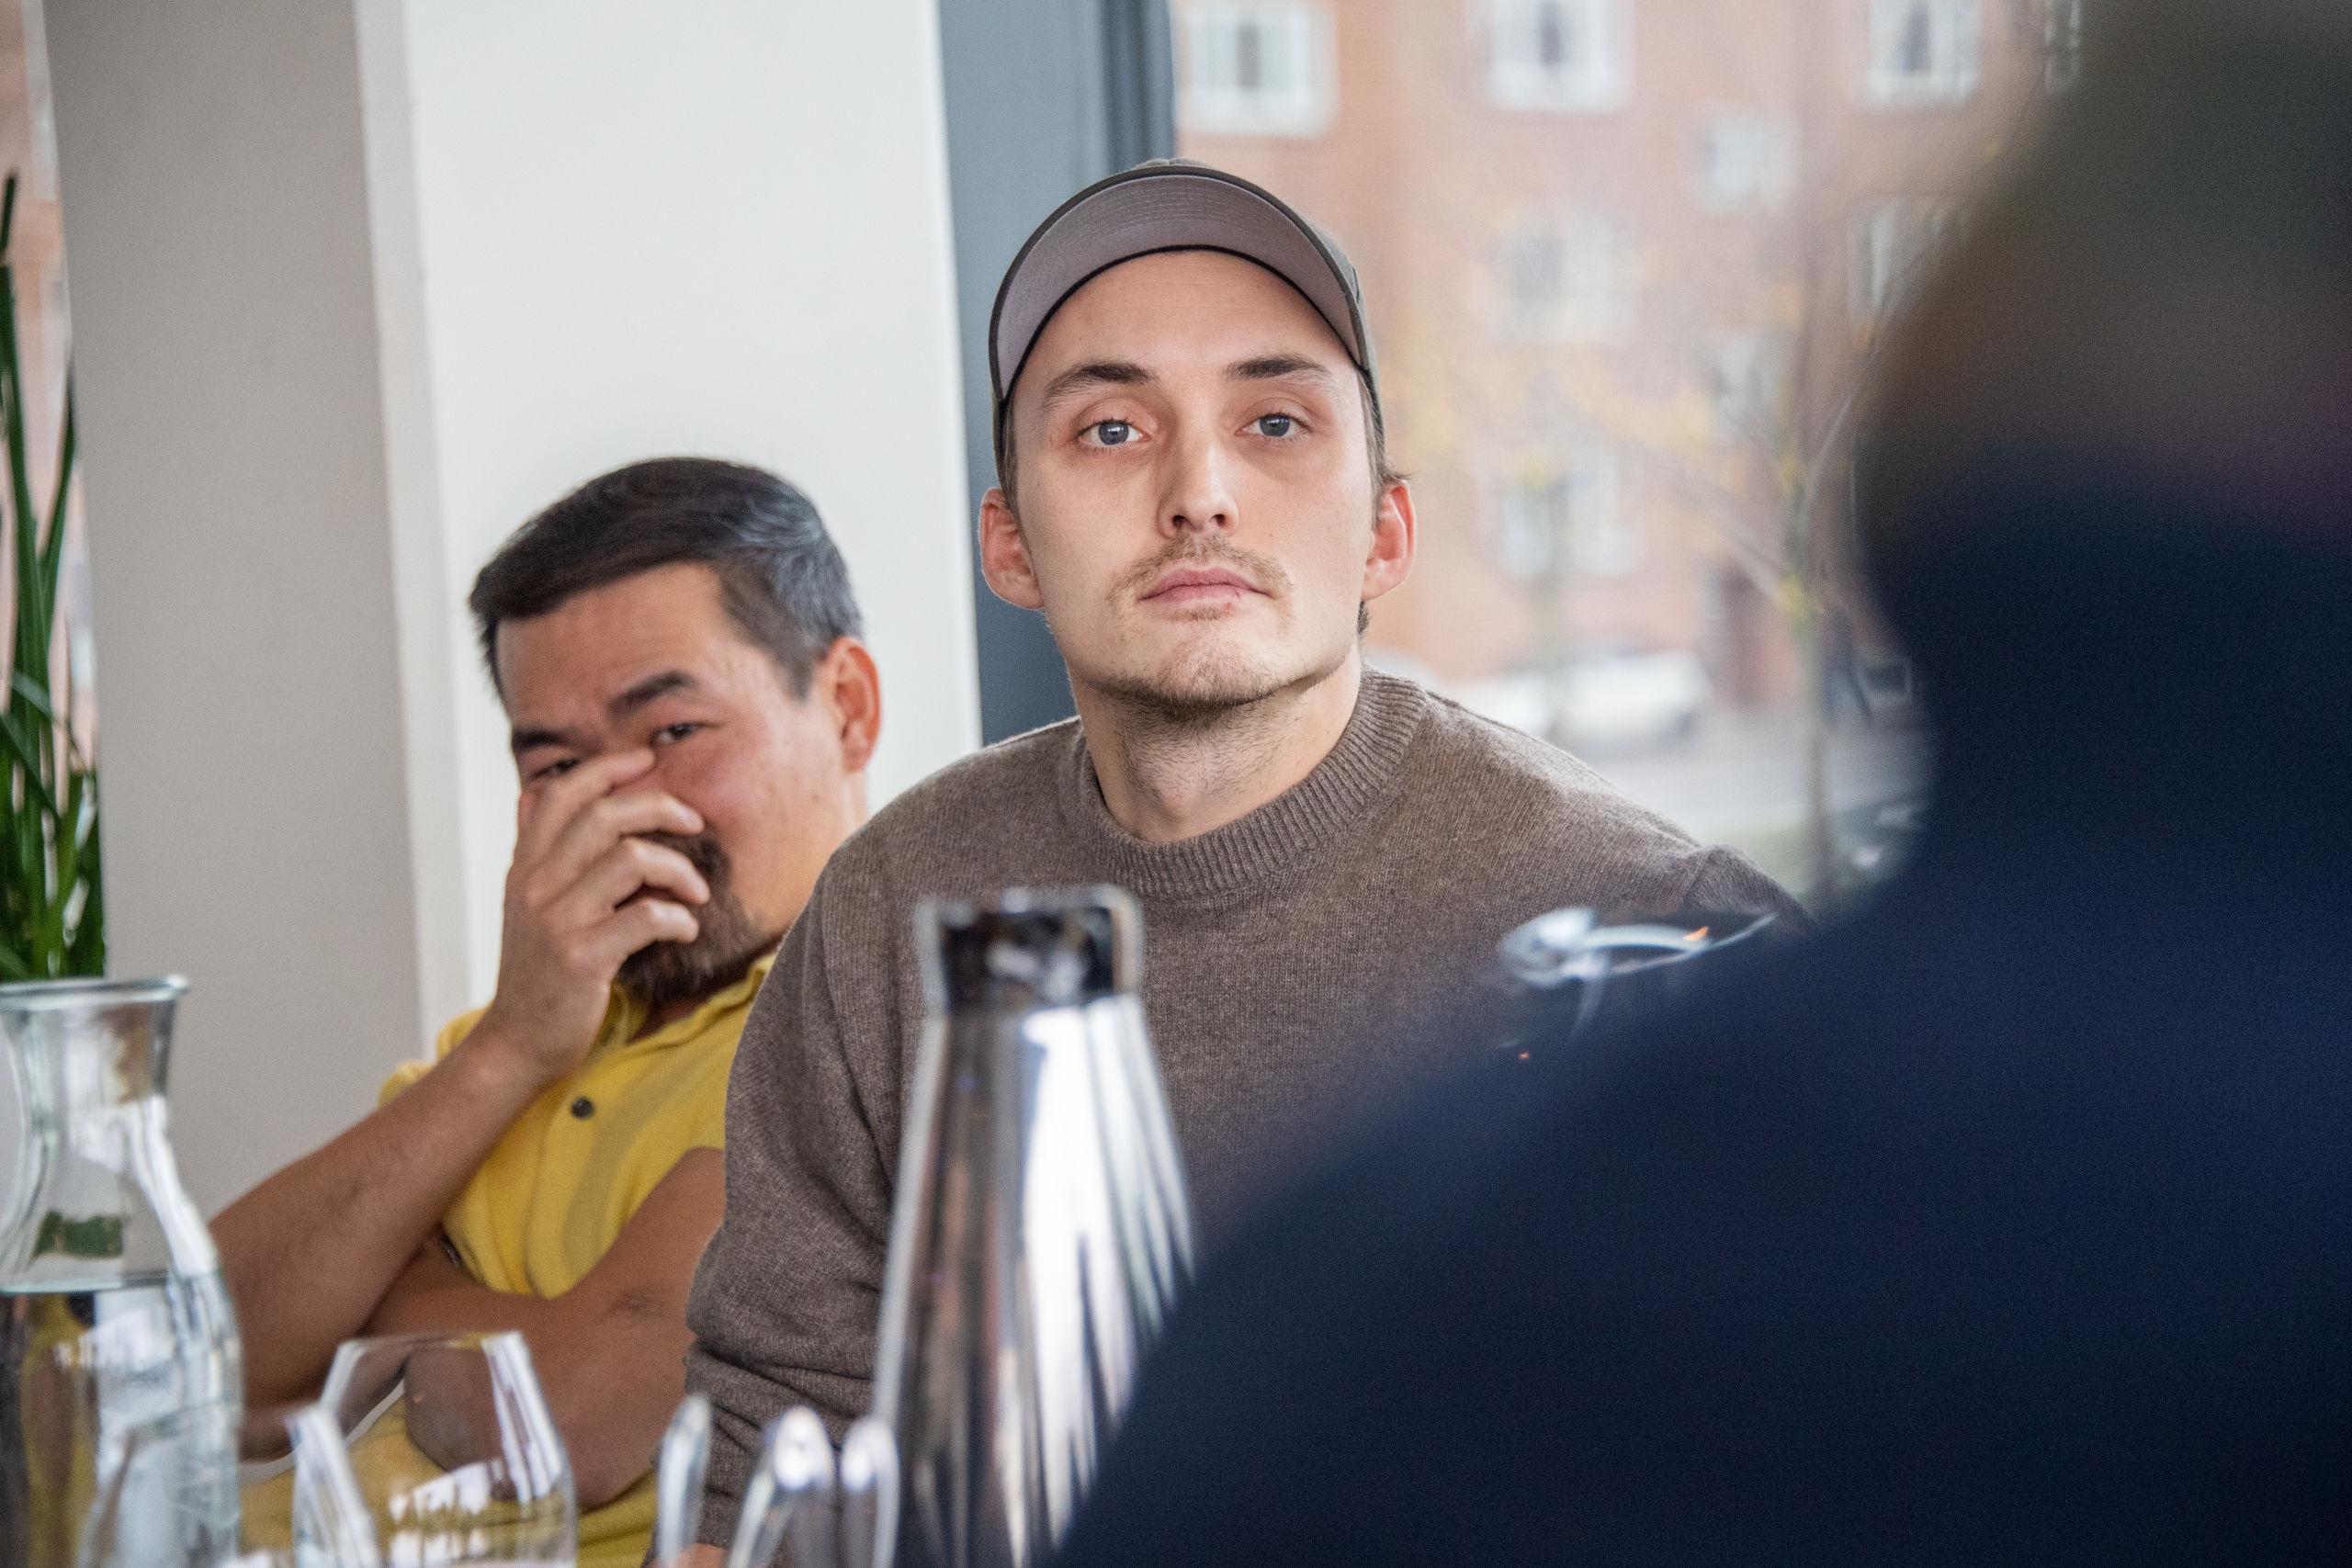 Aalborg-restauranterne La Locanda, Fusion, Tabu og Mortens Kro er med igen i år.